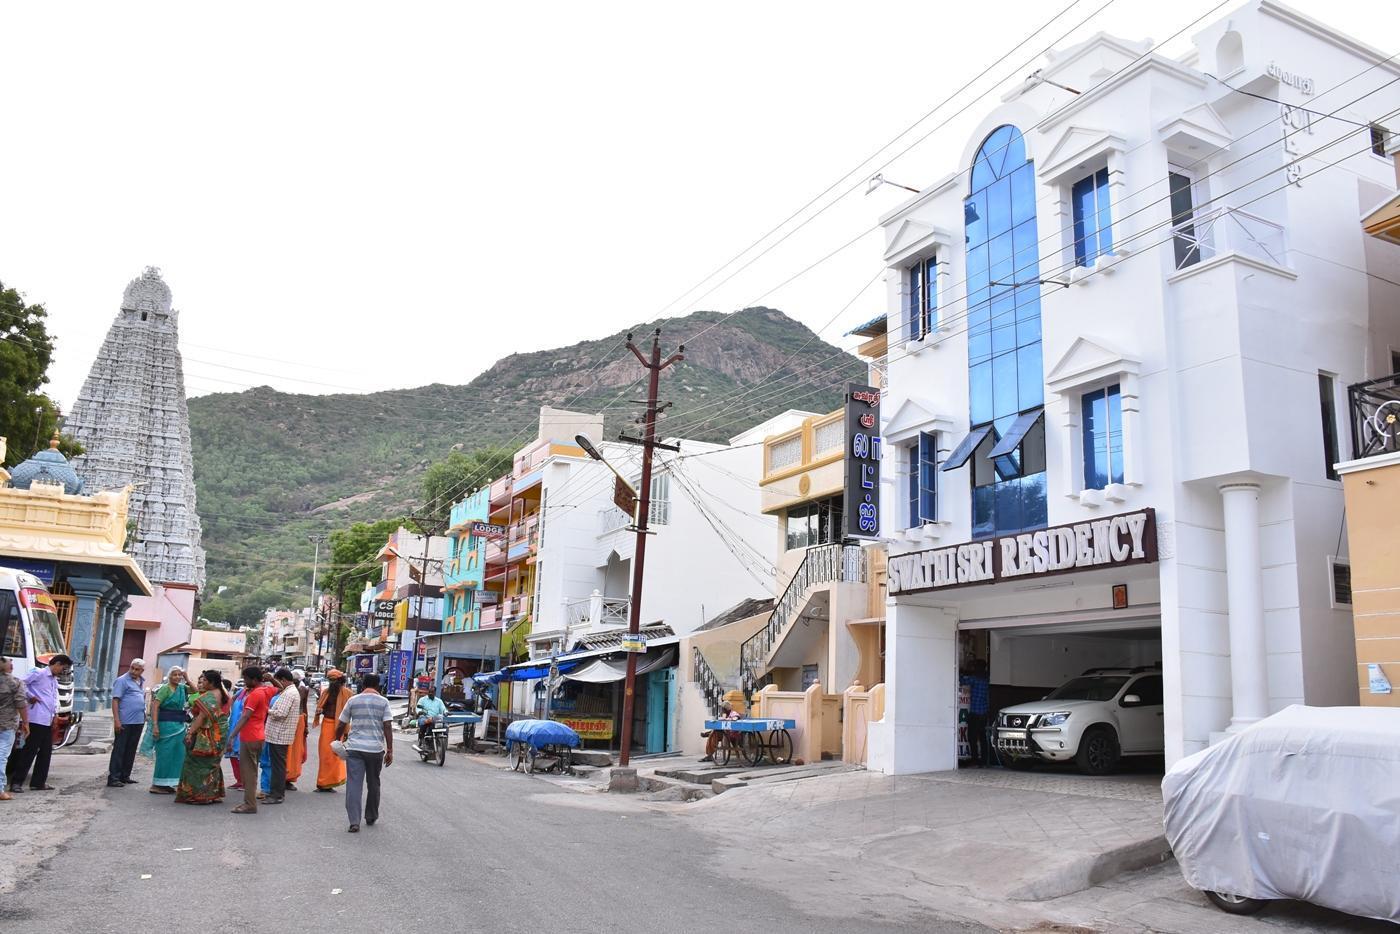 SwathiSri Residency, Tiruvannamalai